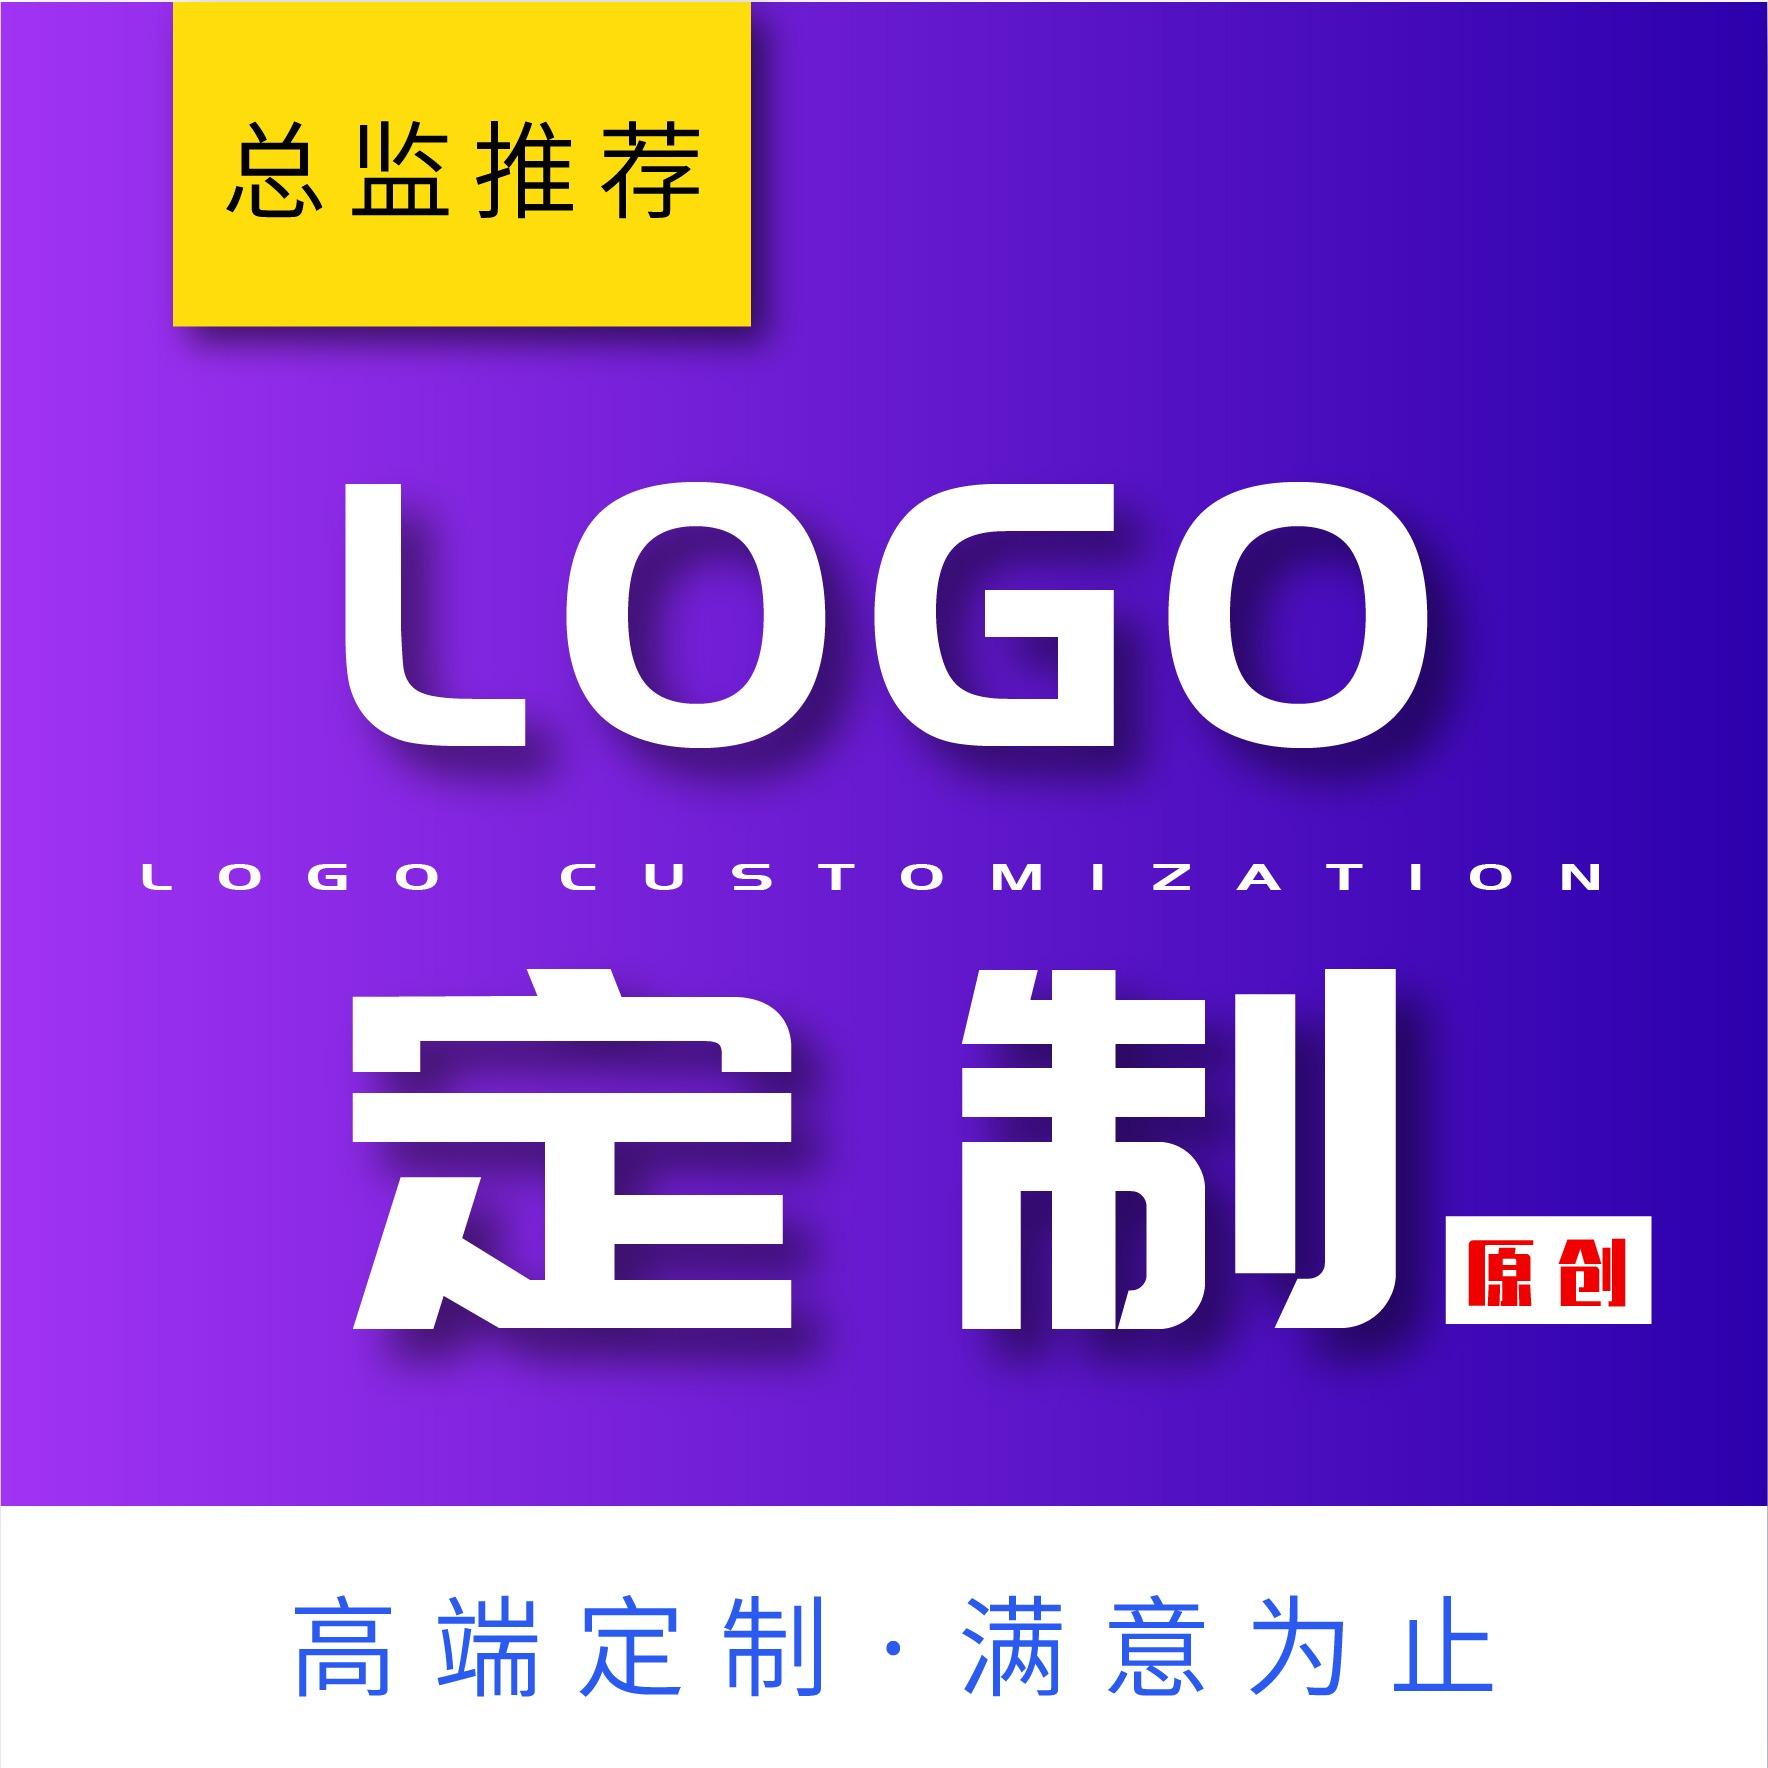 LOGO 设计商标标志设计卡通 logo 设计字体设计餐饮